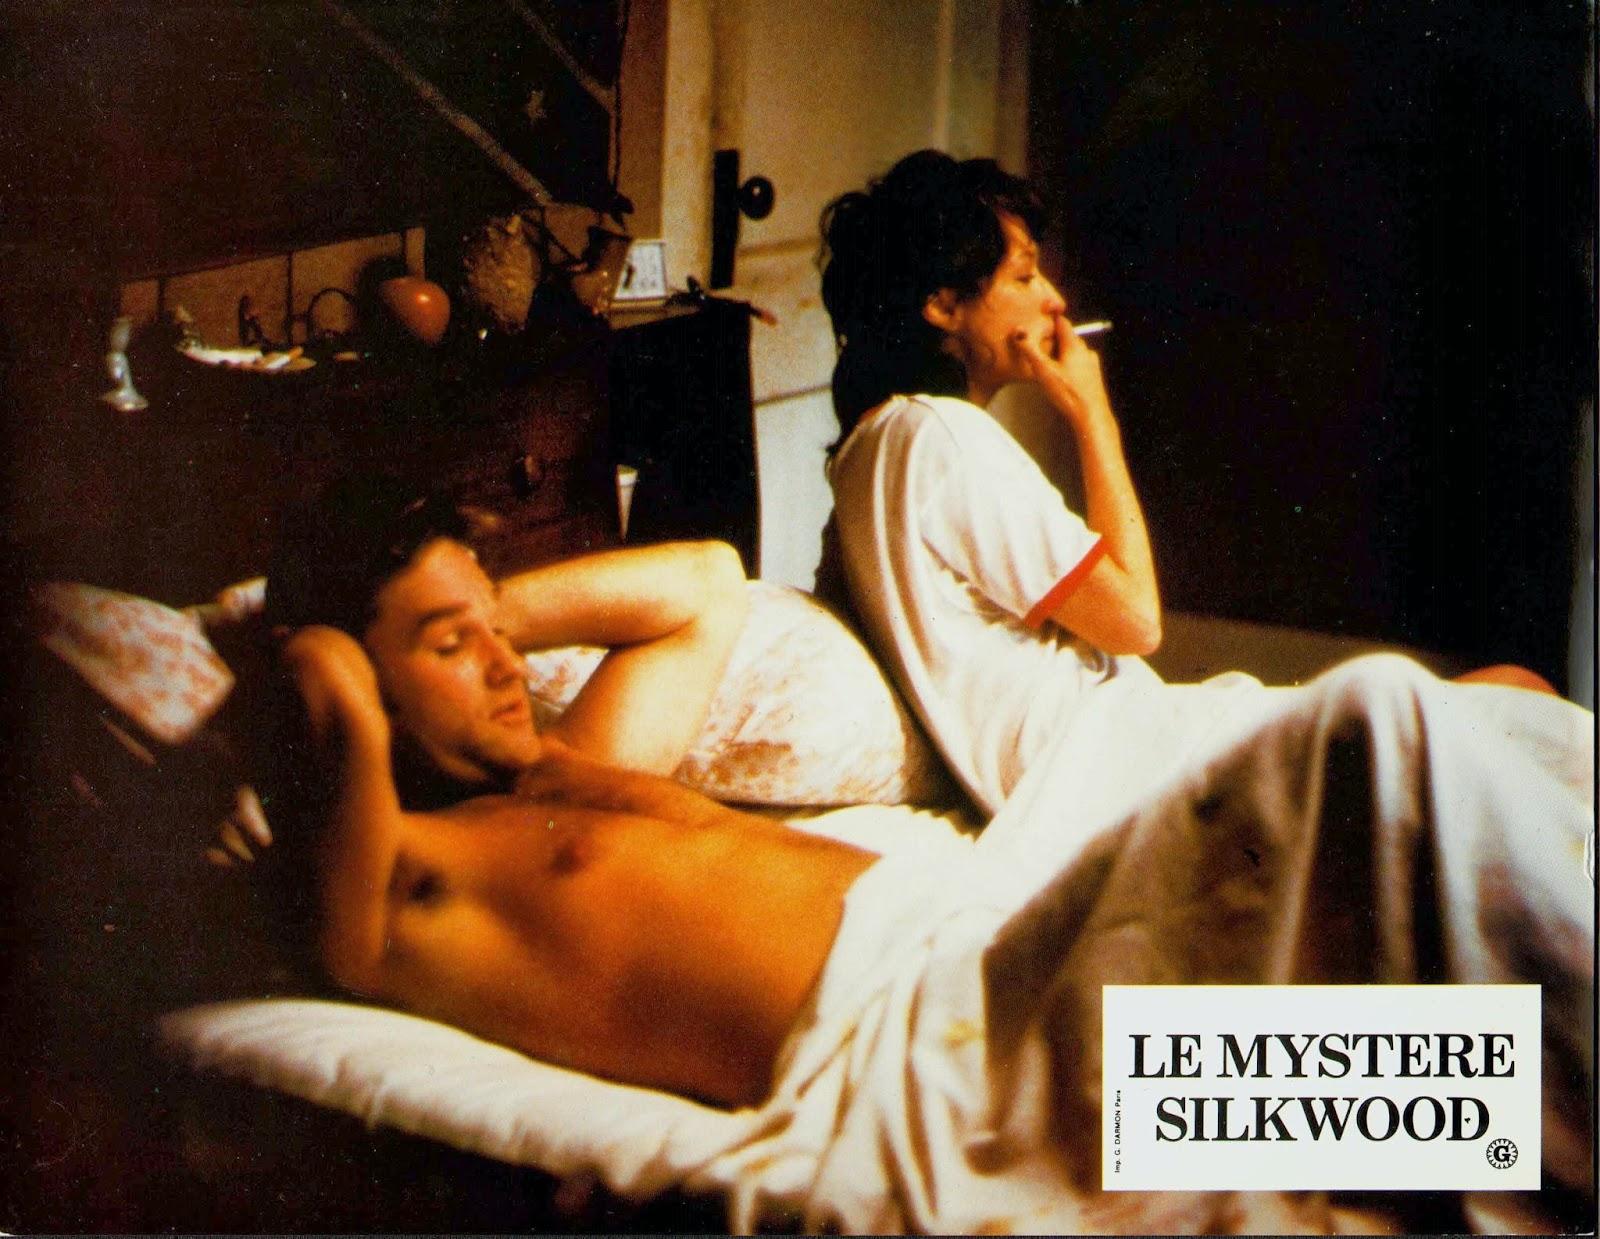 le mystère silkwood streaming